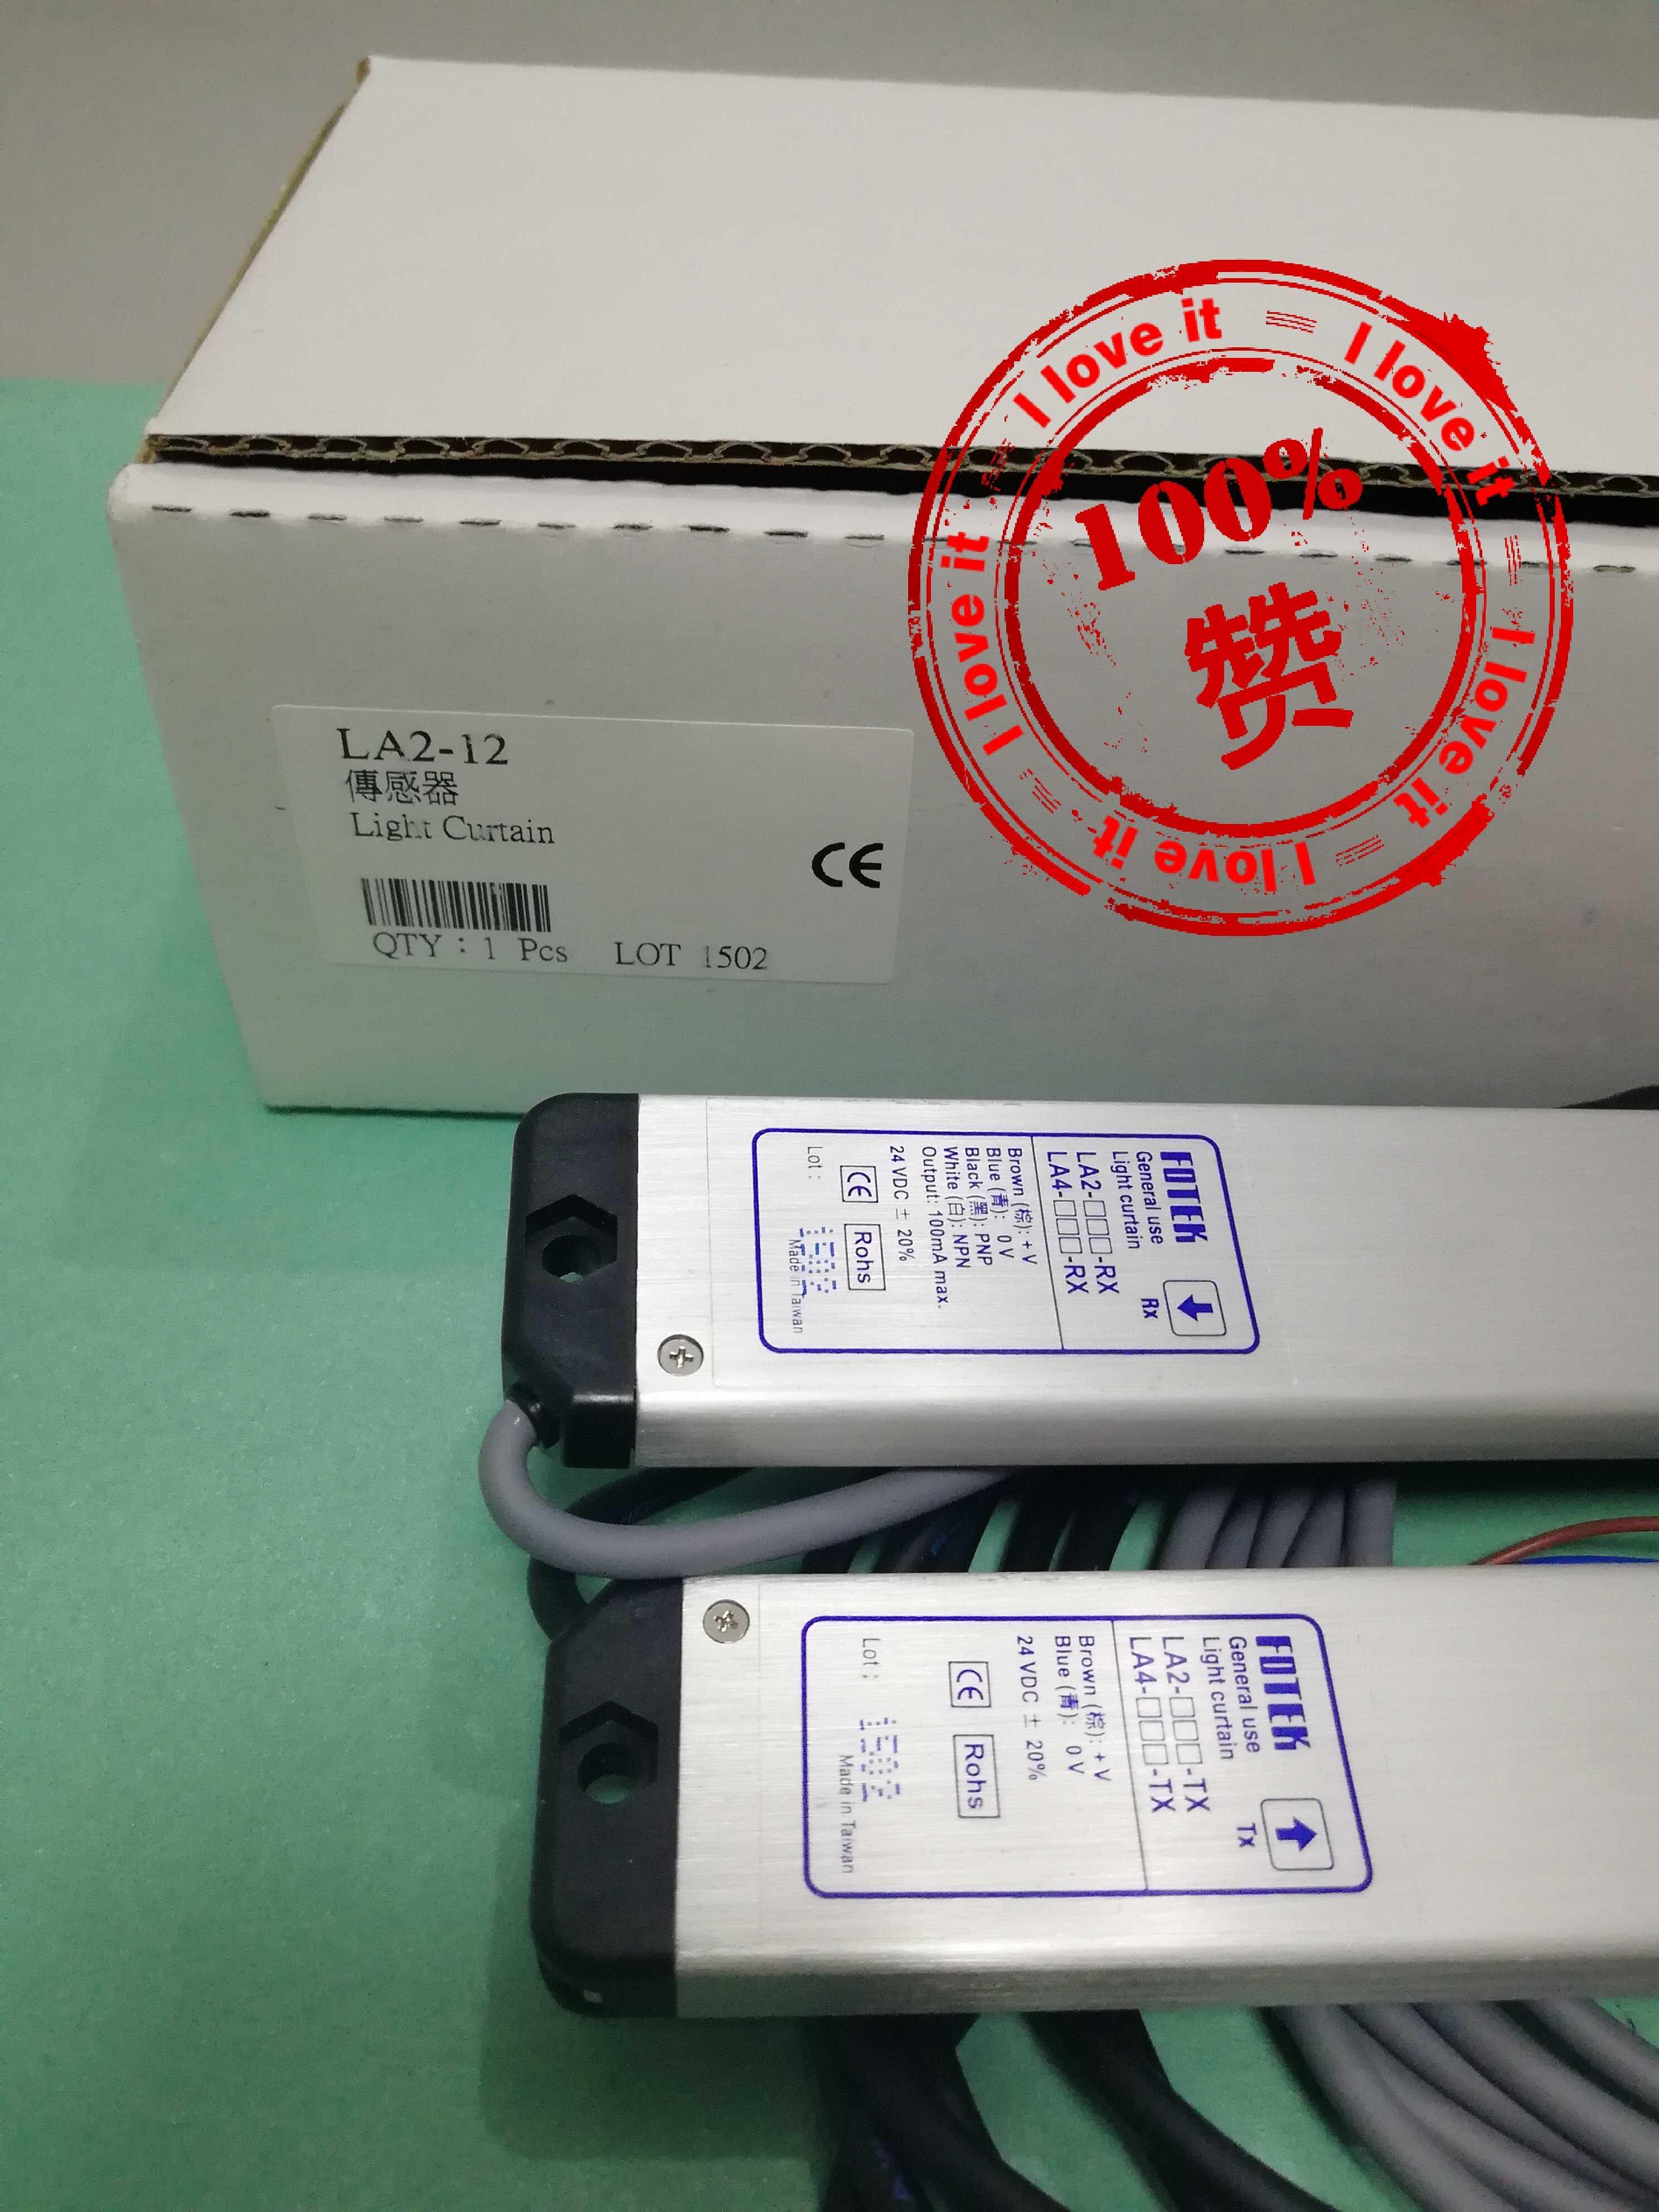 Original imported LA2-12(LA2-12TX, LA2-12RX) safety light screen sensorOriginal imported LA2-12(LA2-12TX, LA2-12RX) safety light screen sensor